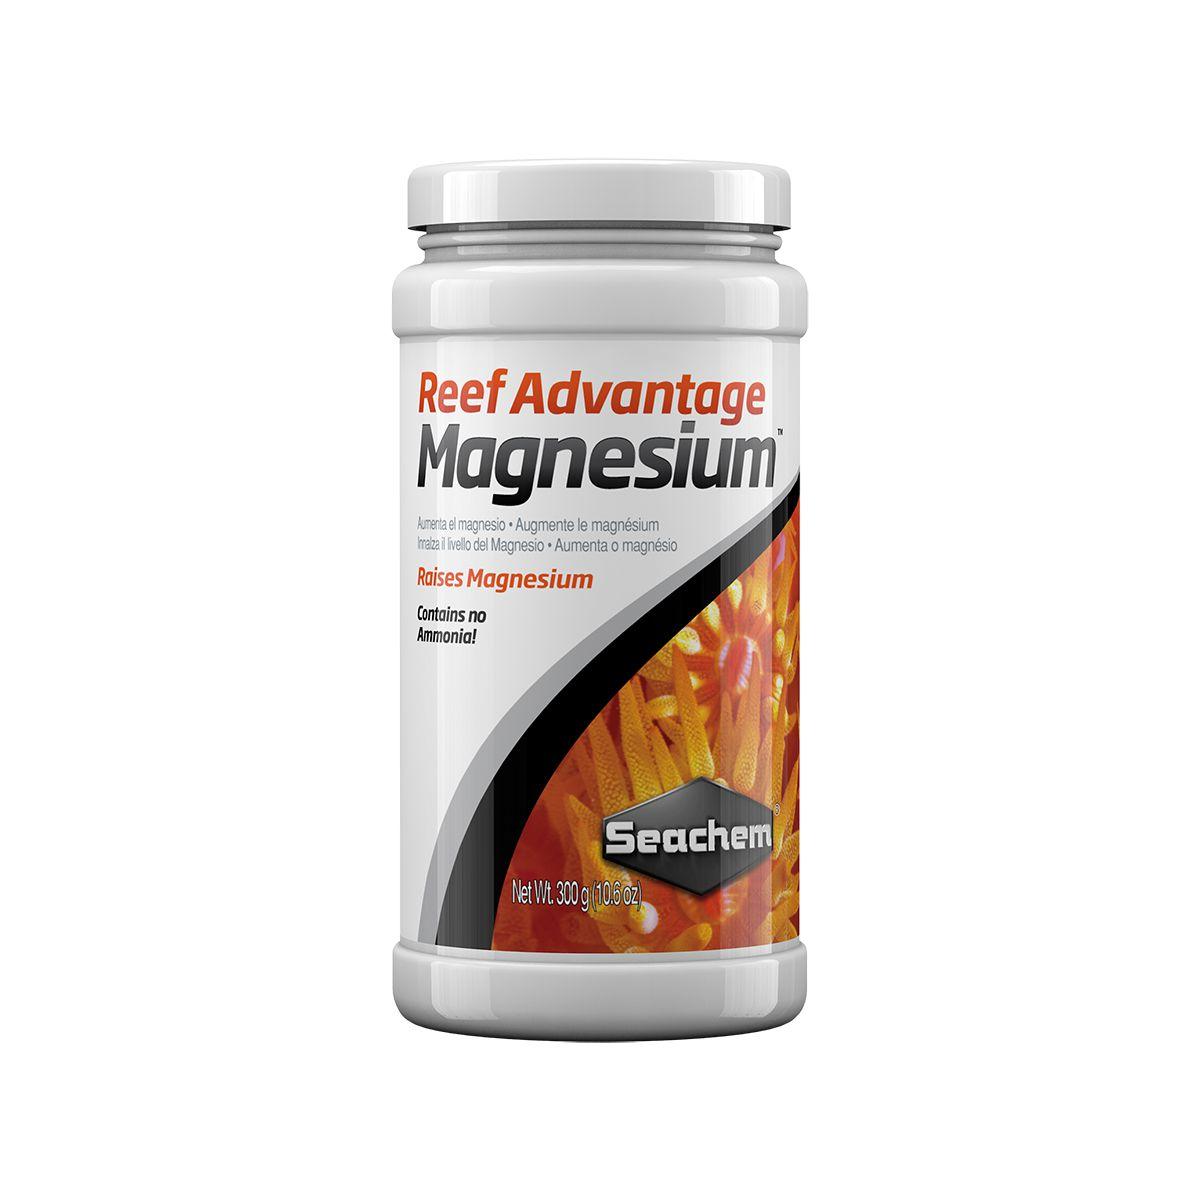 Seachem Reef Advantage Magnesium 300g Restaura e Mantém Mg